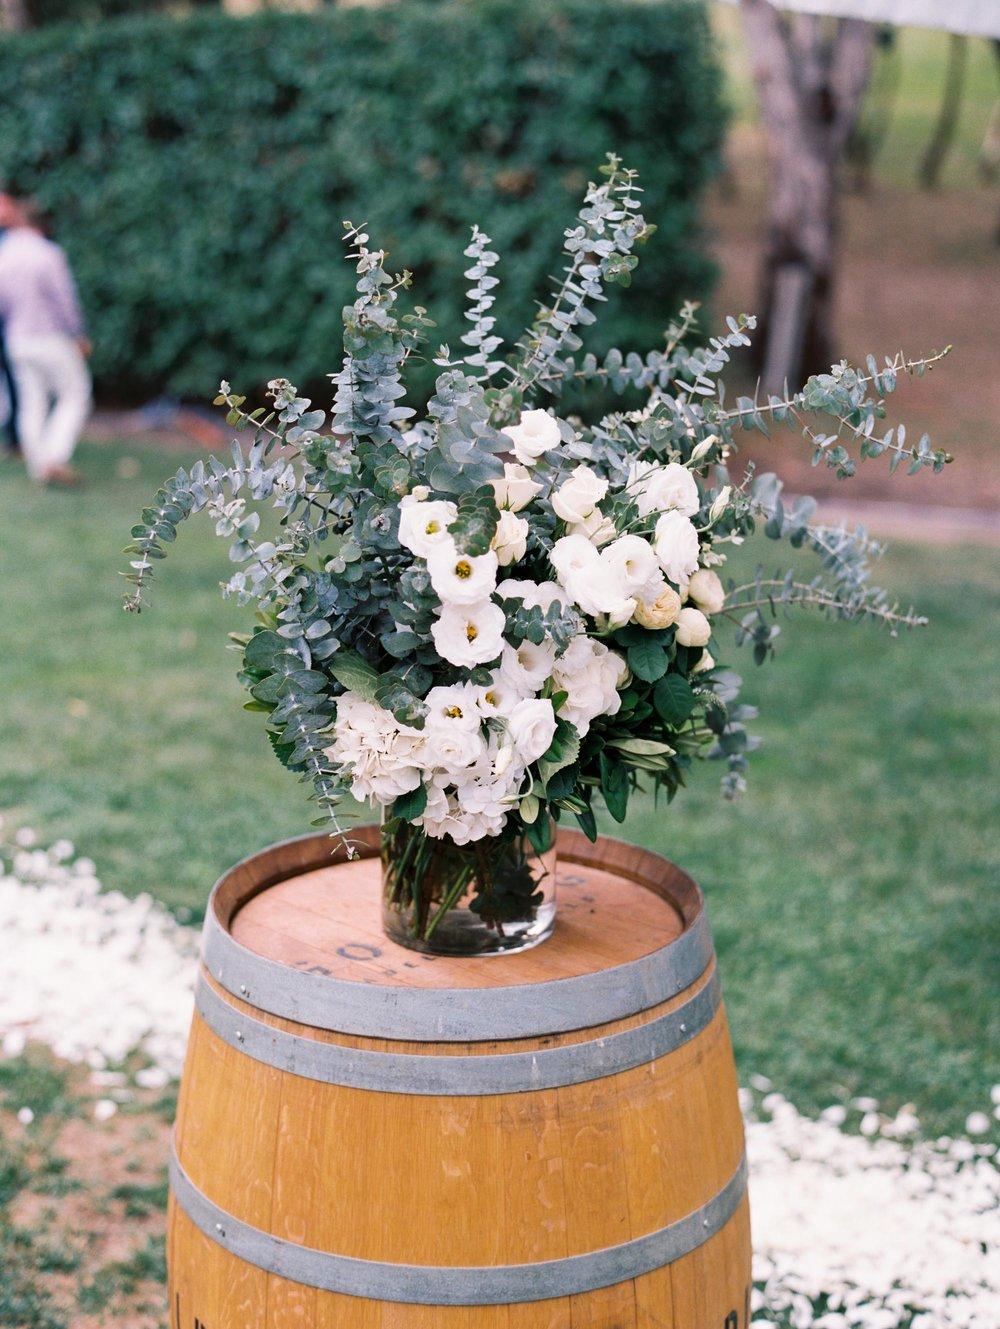 Golding-Wines-wedding-photography-041.jpg